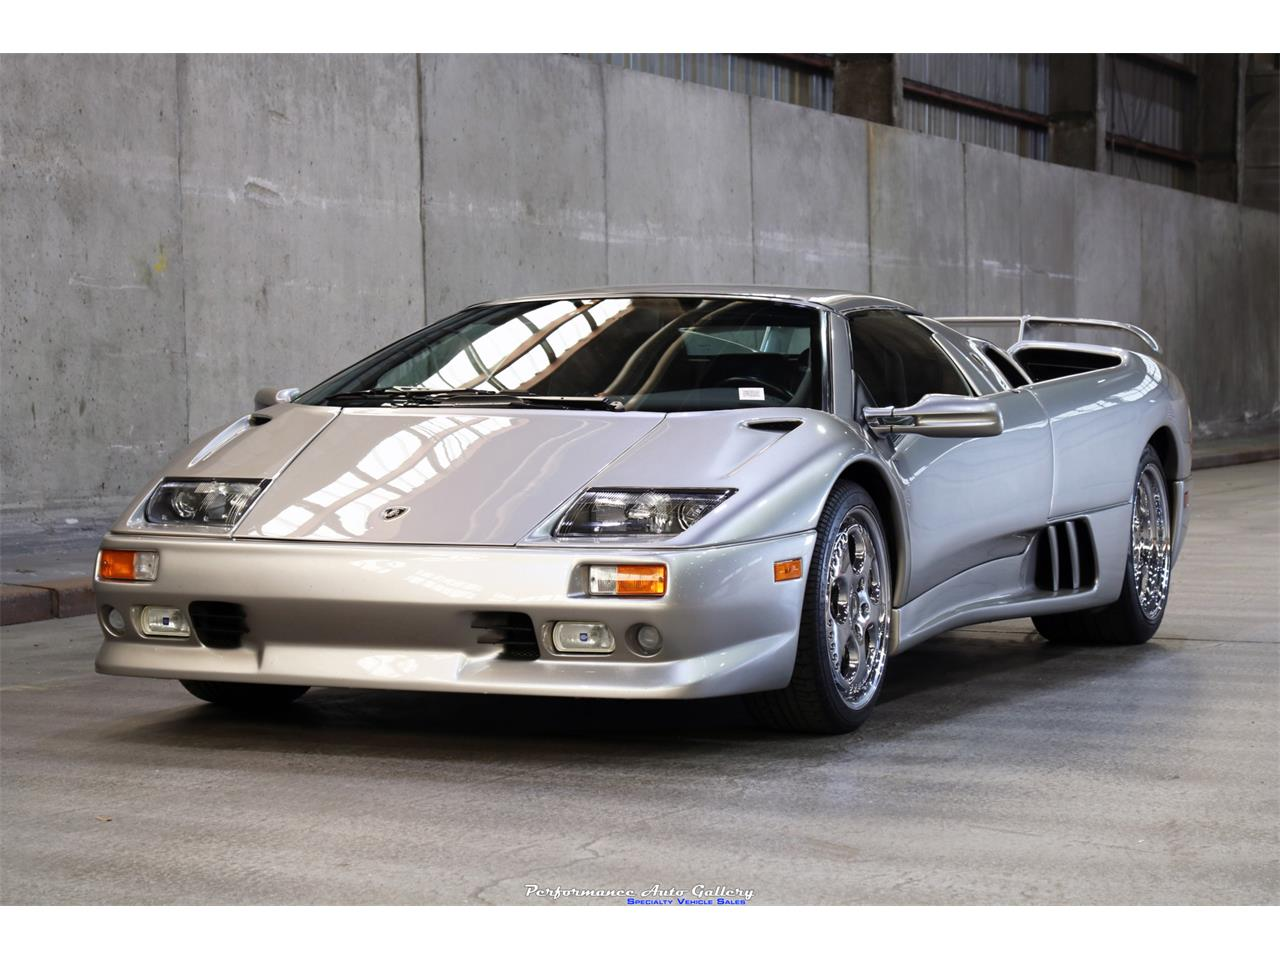 1999 Lamborghini Diablo For Sale Classiccars Com Cc 1218346